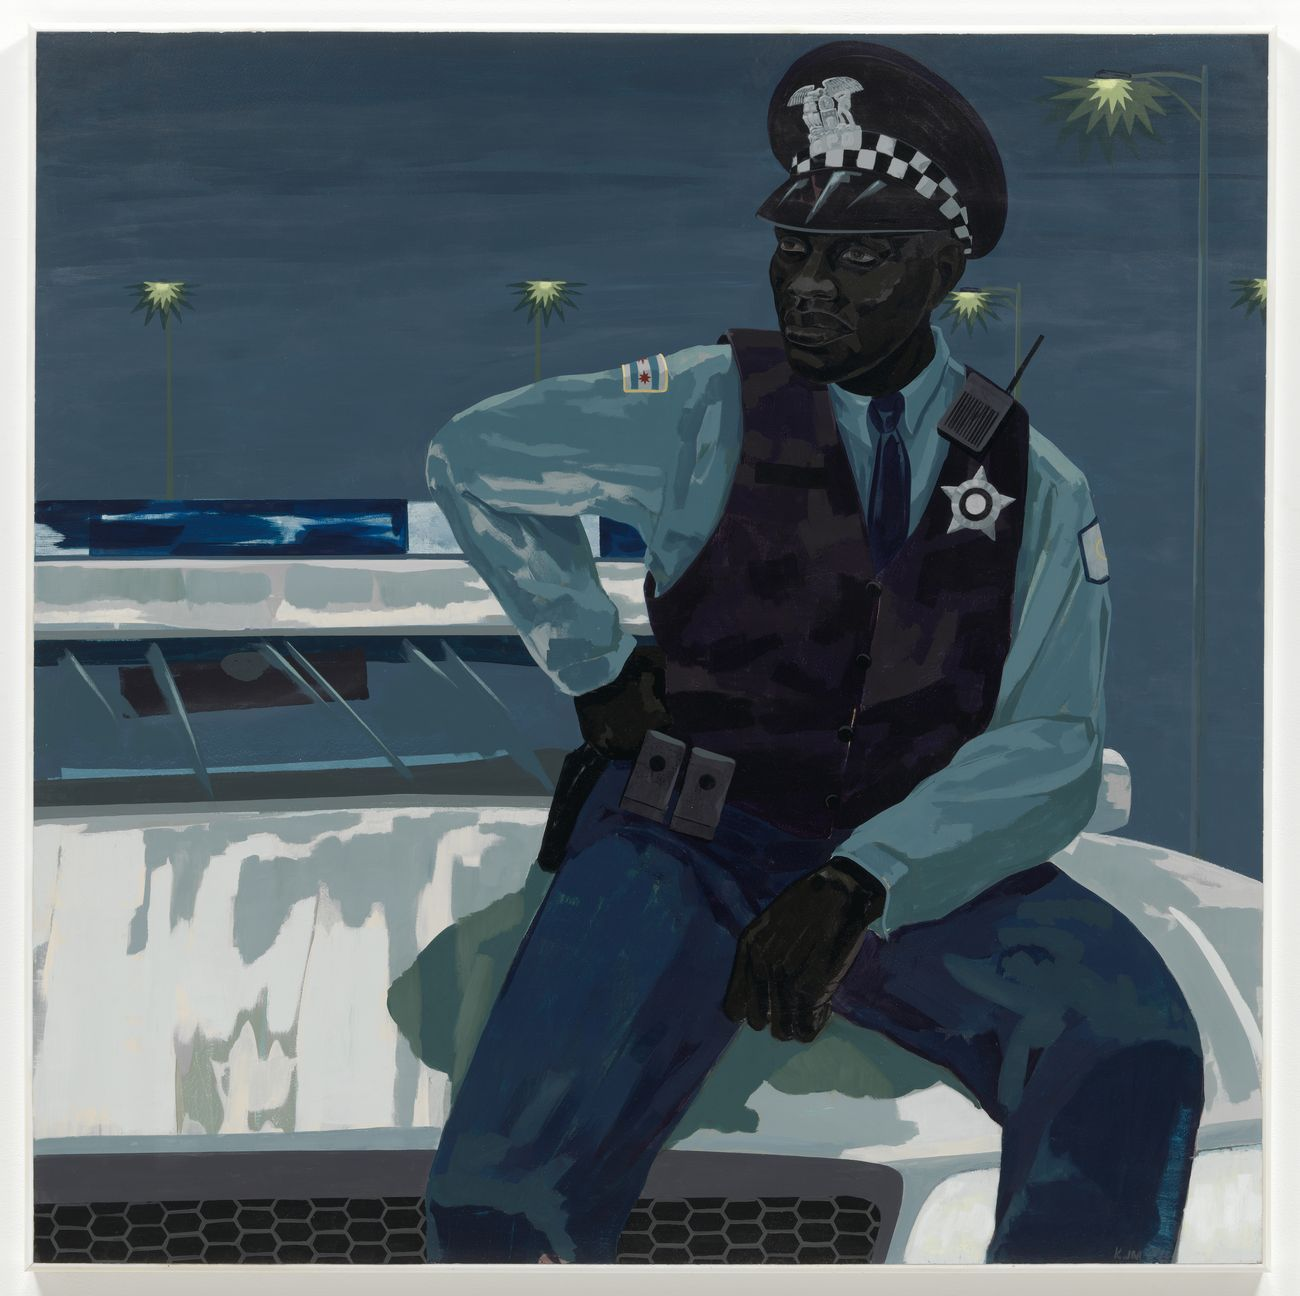 Kerry James Marshall, Untitled (policeman), 2015. Museum of Modern Art © Kerry James Marshall. Courtesy the artist & Jack Shainman Gallery, New York